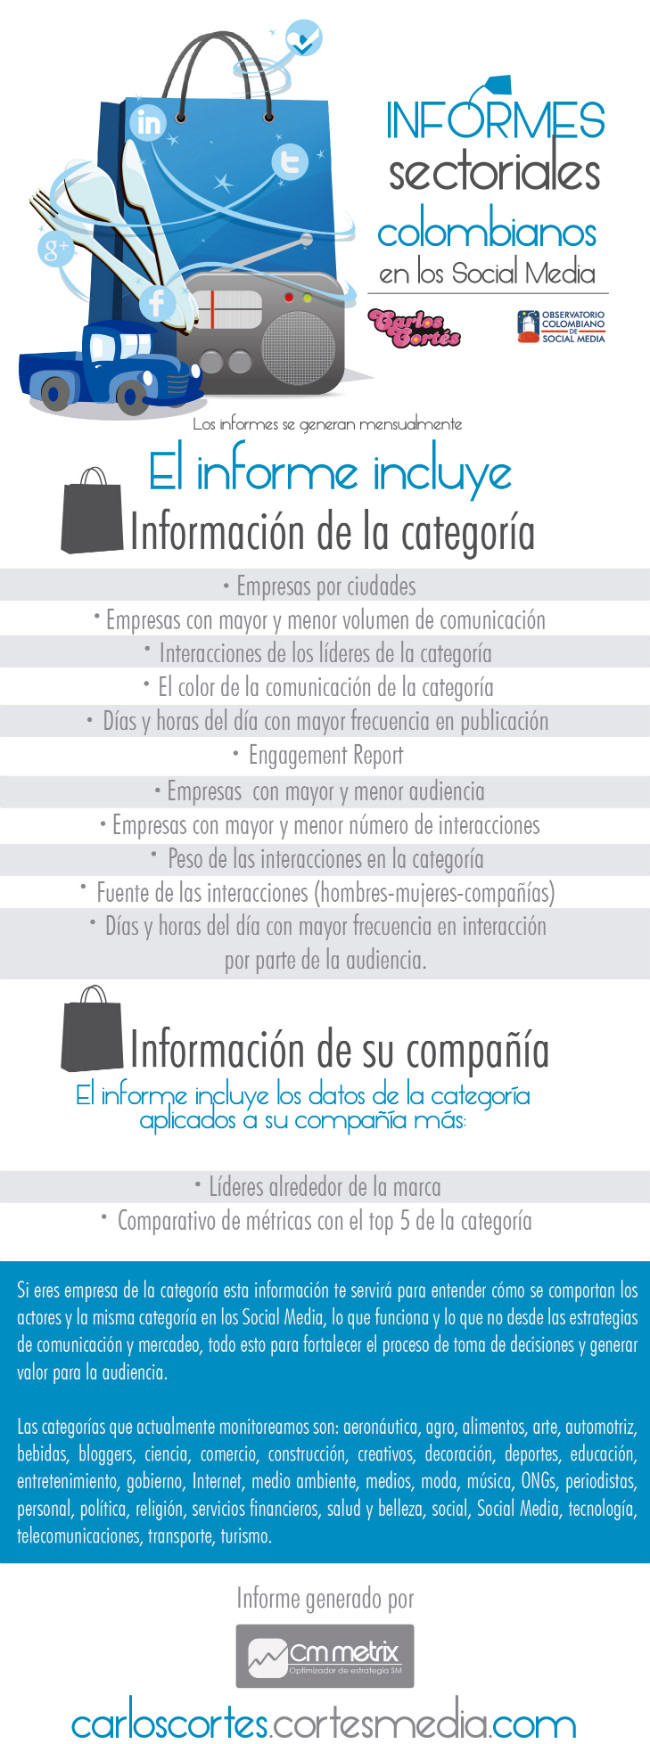 informes-sectoriales-social-media-colombia